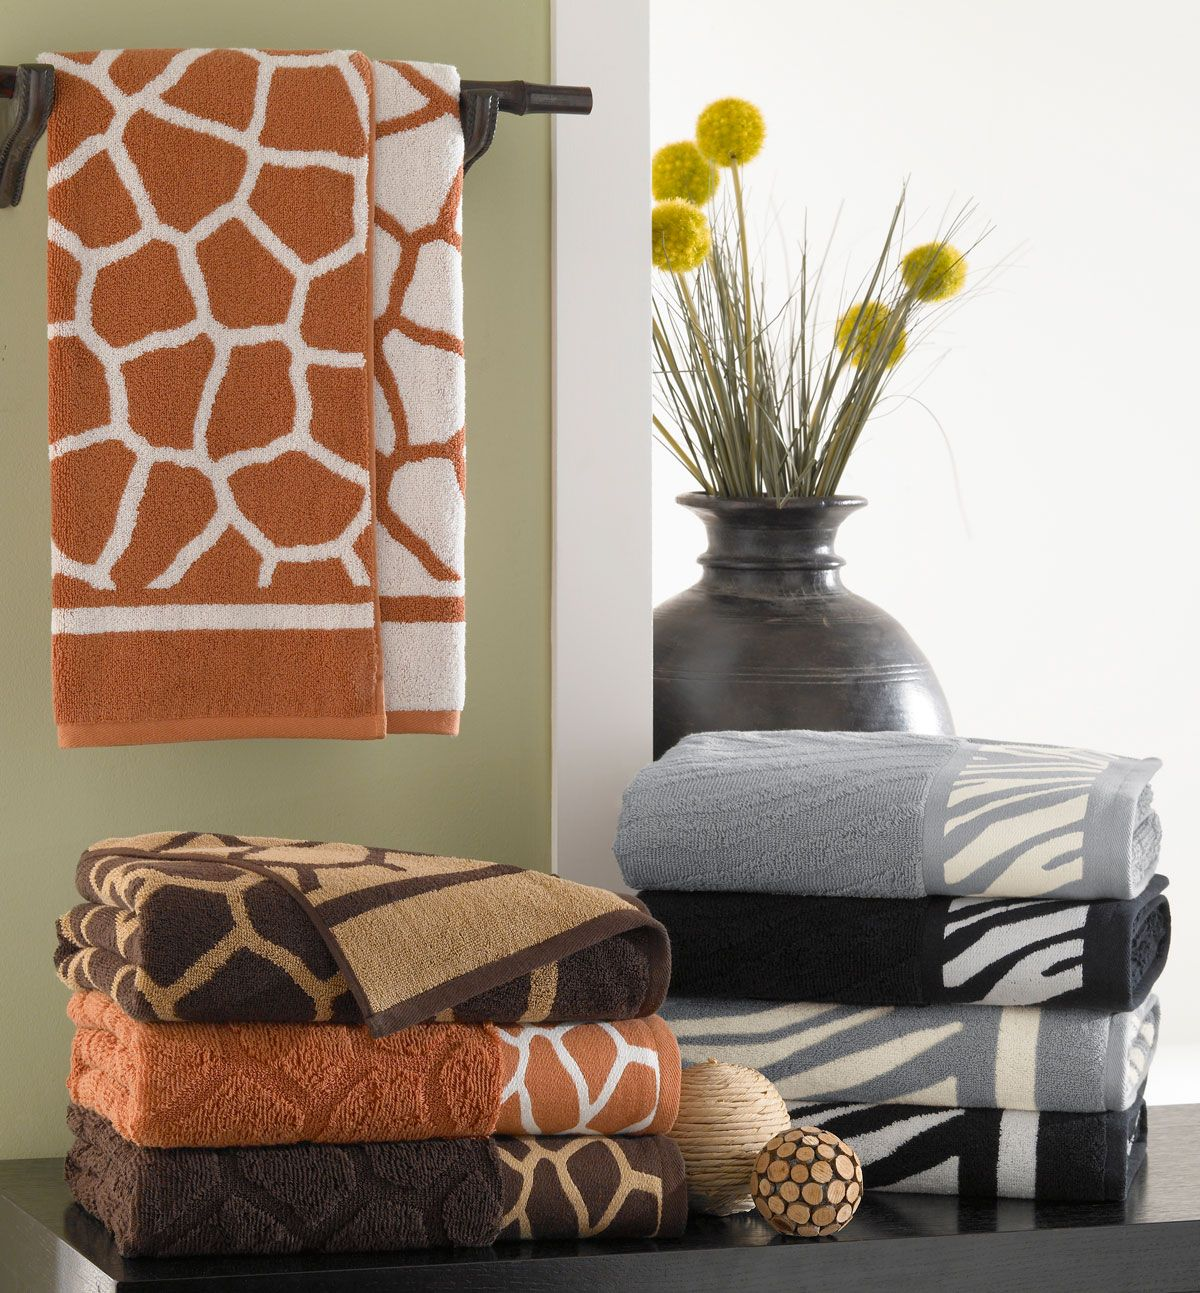 Giraffe Bathroom Sets Giraffe 100 Fine Cotton Jacquard Towels